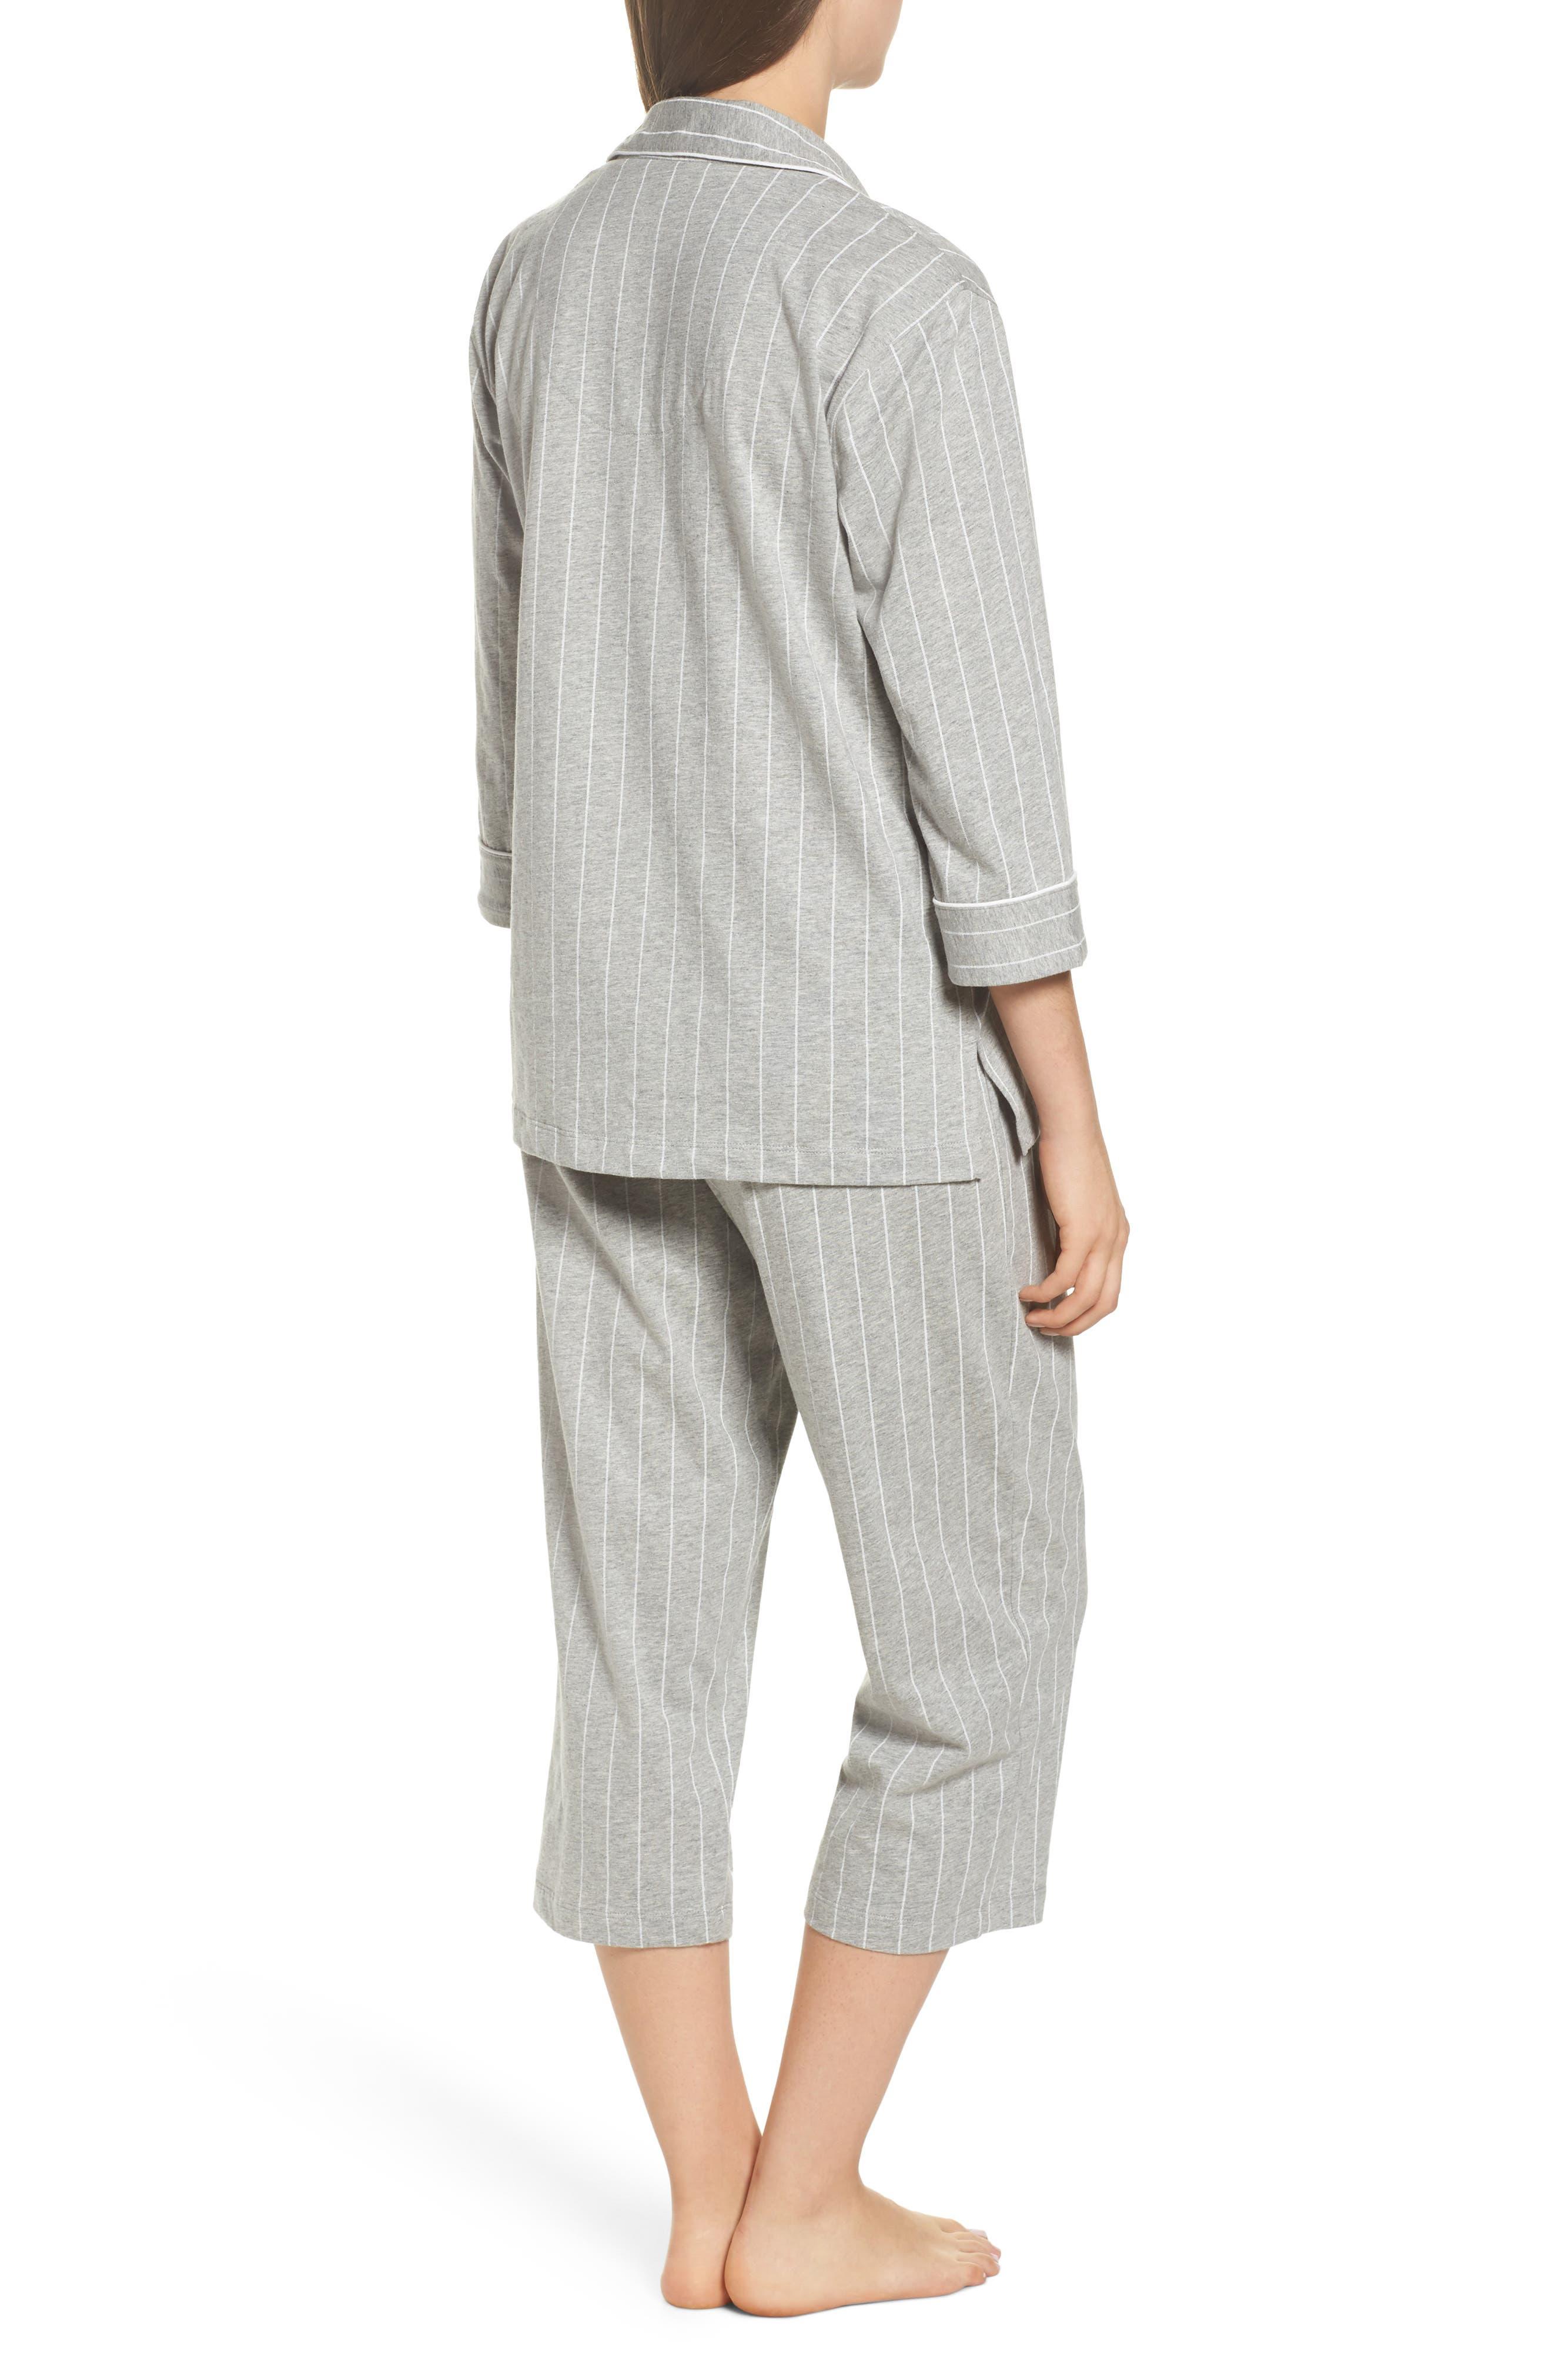 LAUREN RALPH LAUREN, Knit Crop Pajamas, Alternate thumbnail 2, color, GREYSTONE